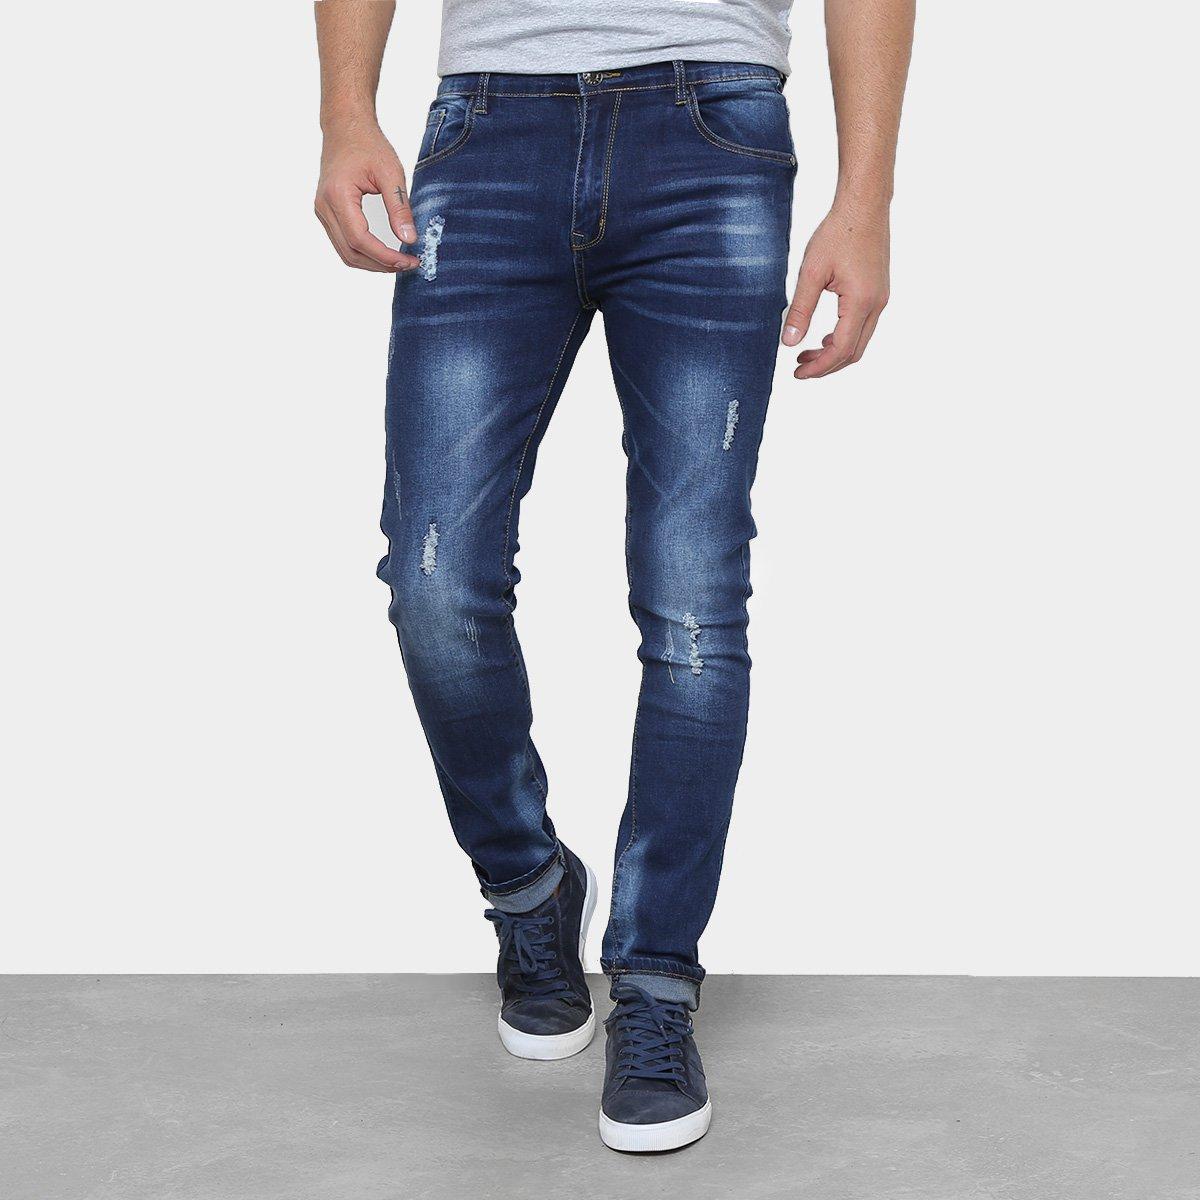 523e5cb2c Calça Jeans Skinny WATKINS&KROWN Estonada Cintura Média Masculina